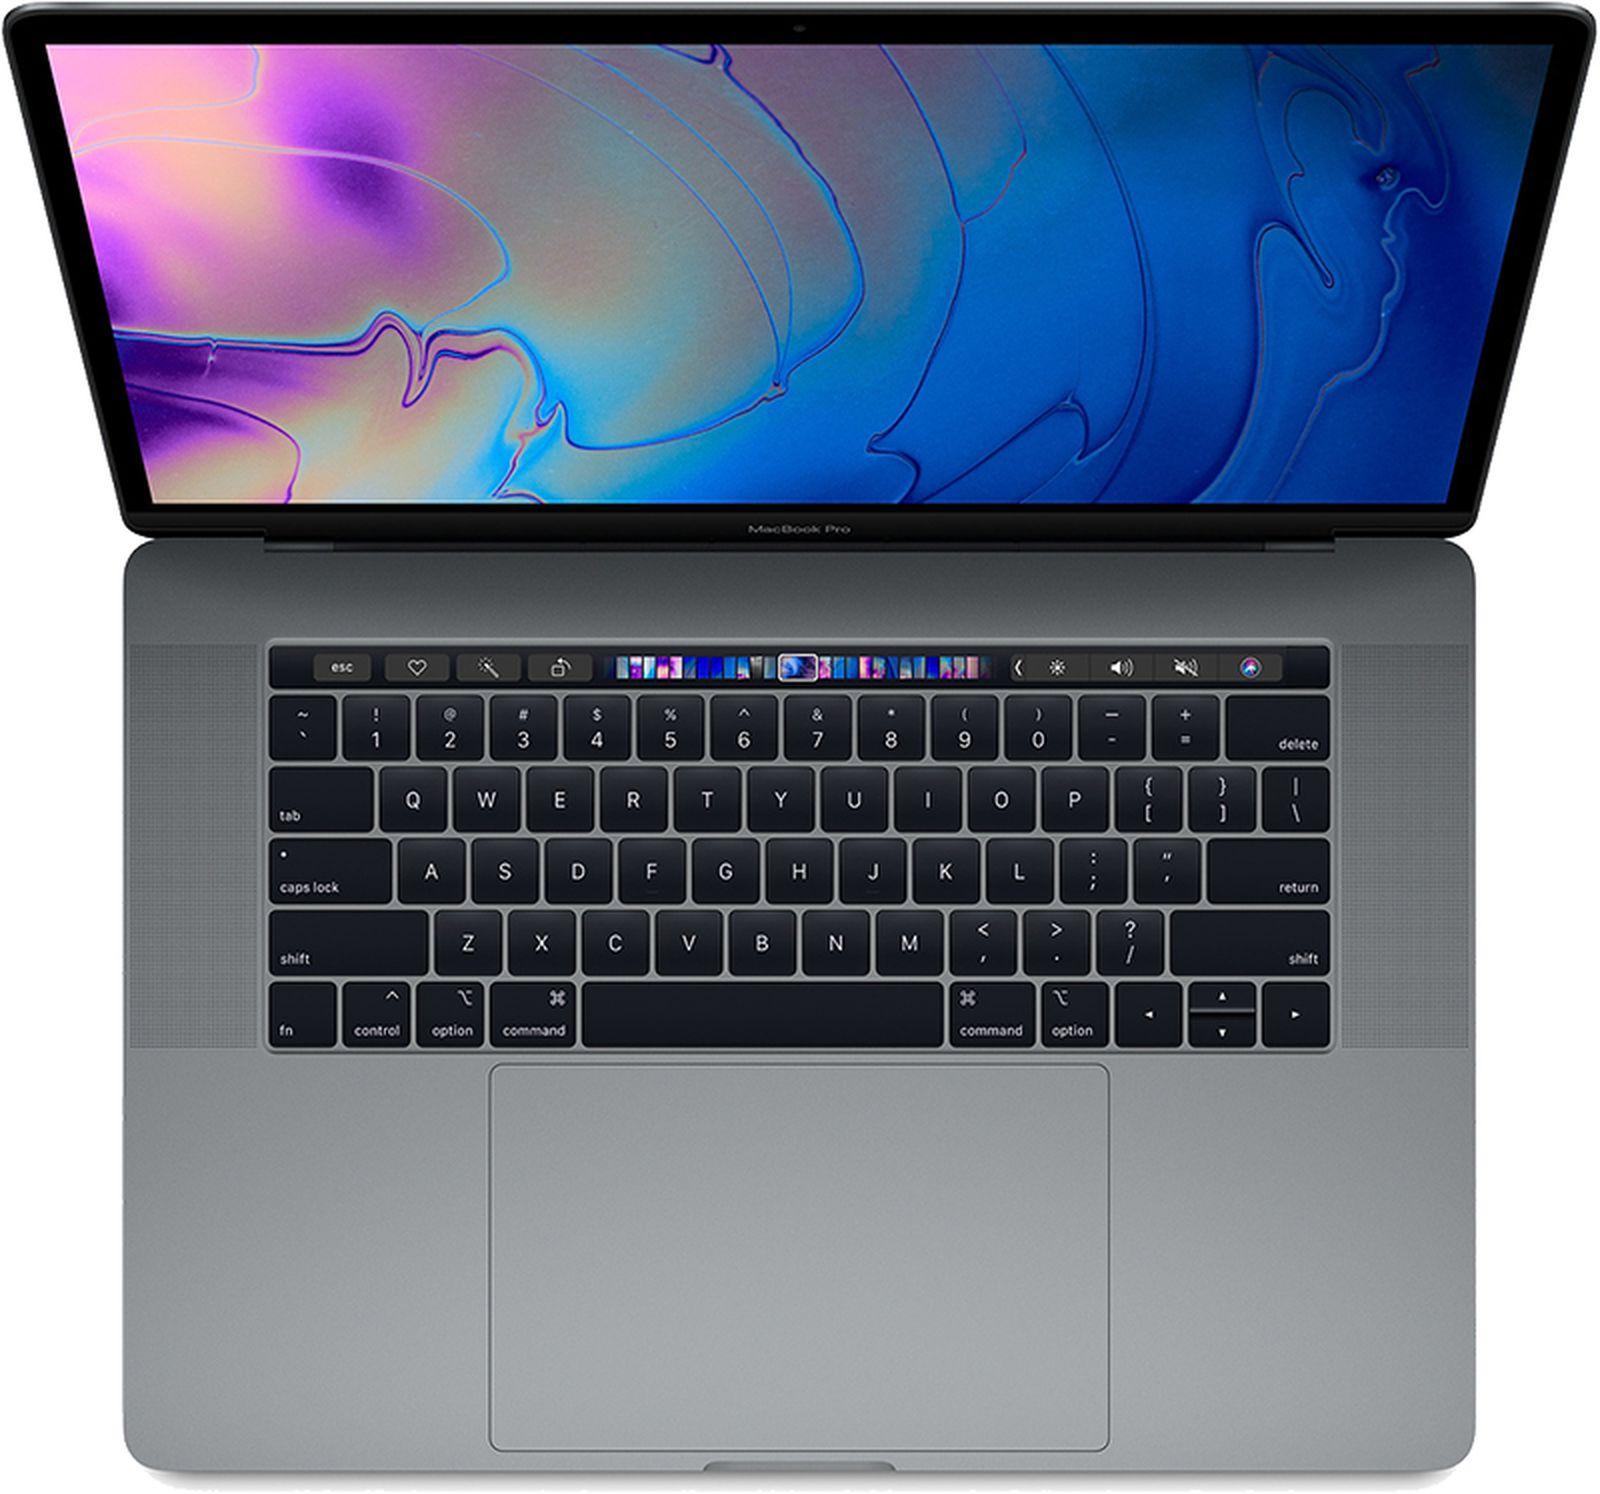 Key Takeaways of 2018 MacBook Pro vs. 2017 MacBook Pro - MacRumors